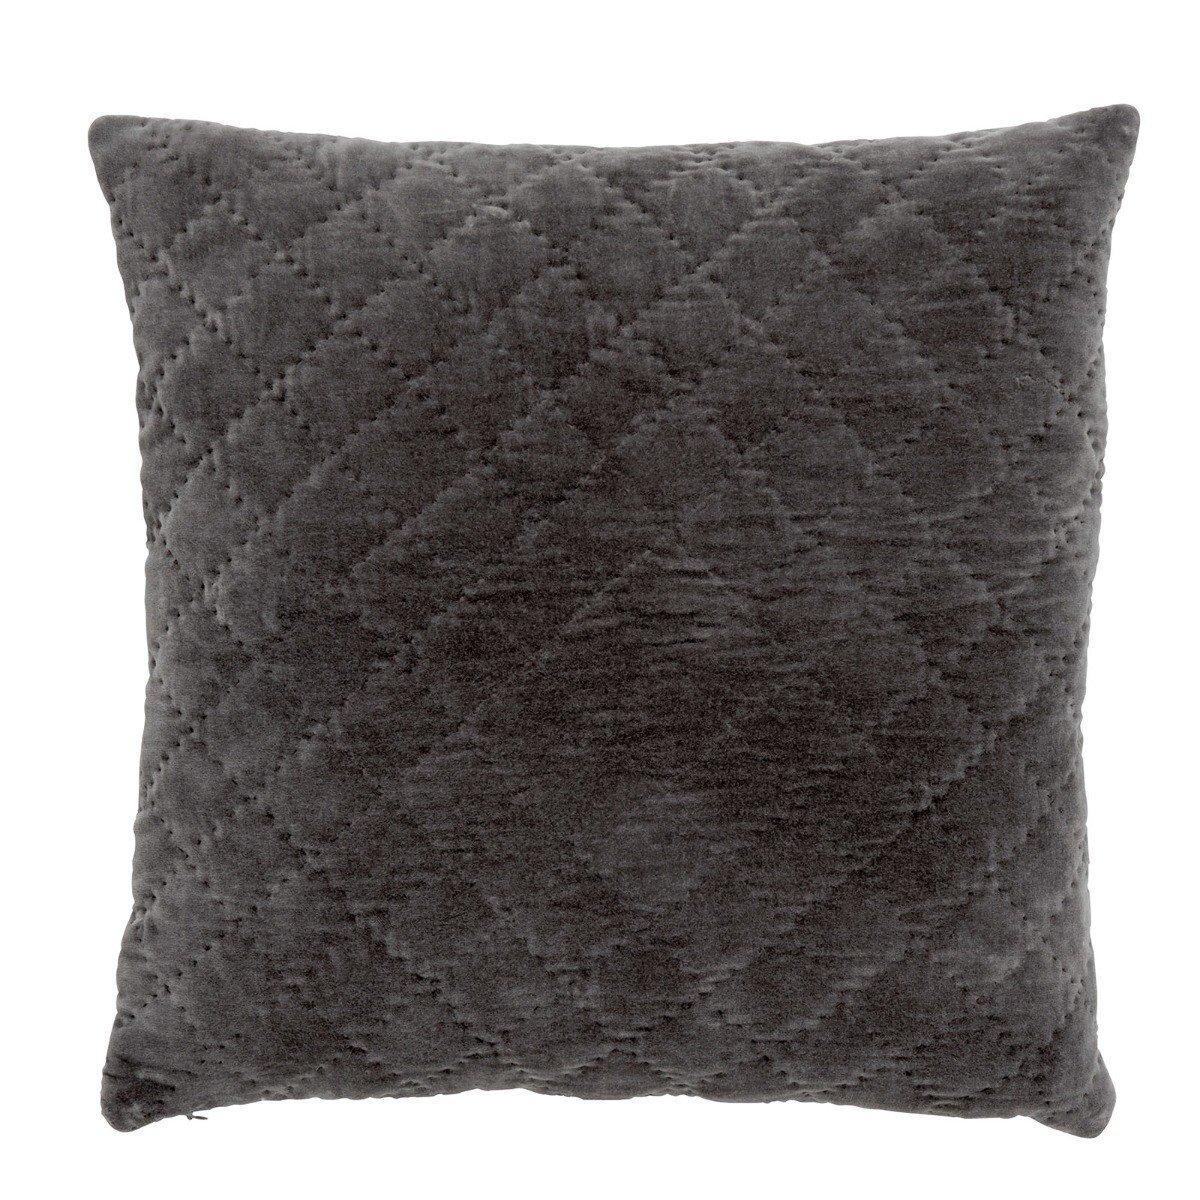 Nordal kussenhoes quilt velvet grijs 50 x 50